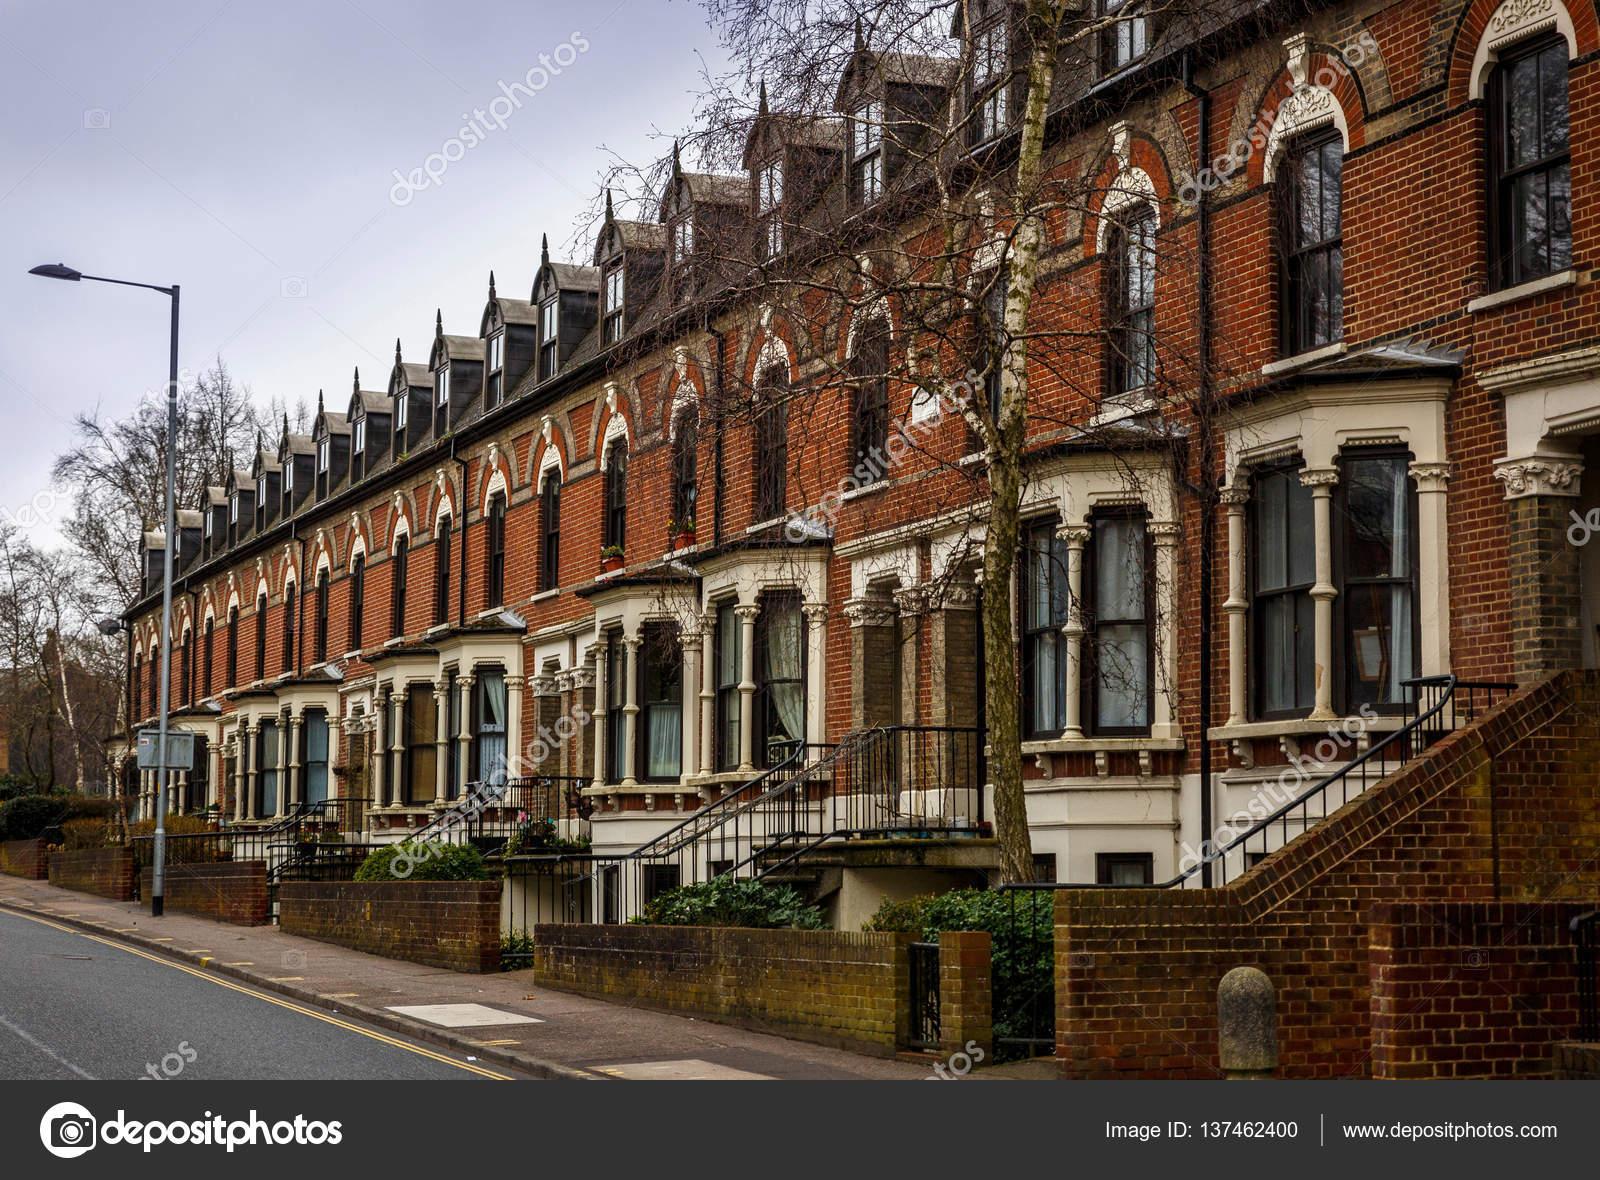 Una piccola vista di case inglesi foto stock oscar for Case inglesi foto